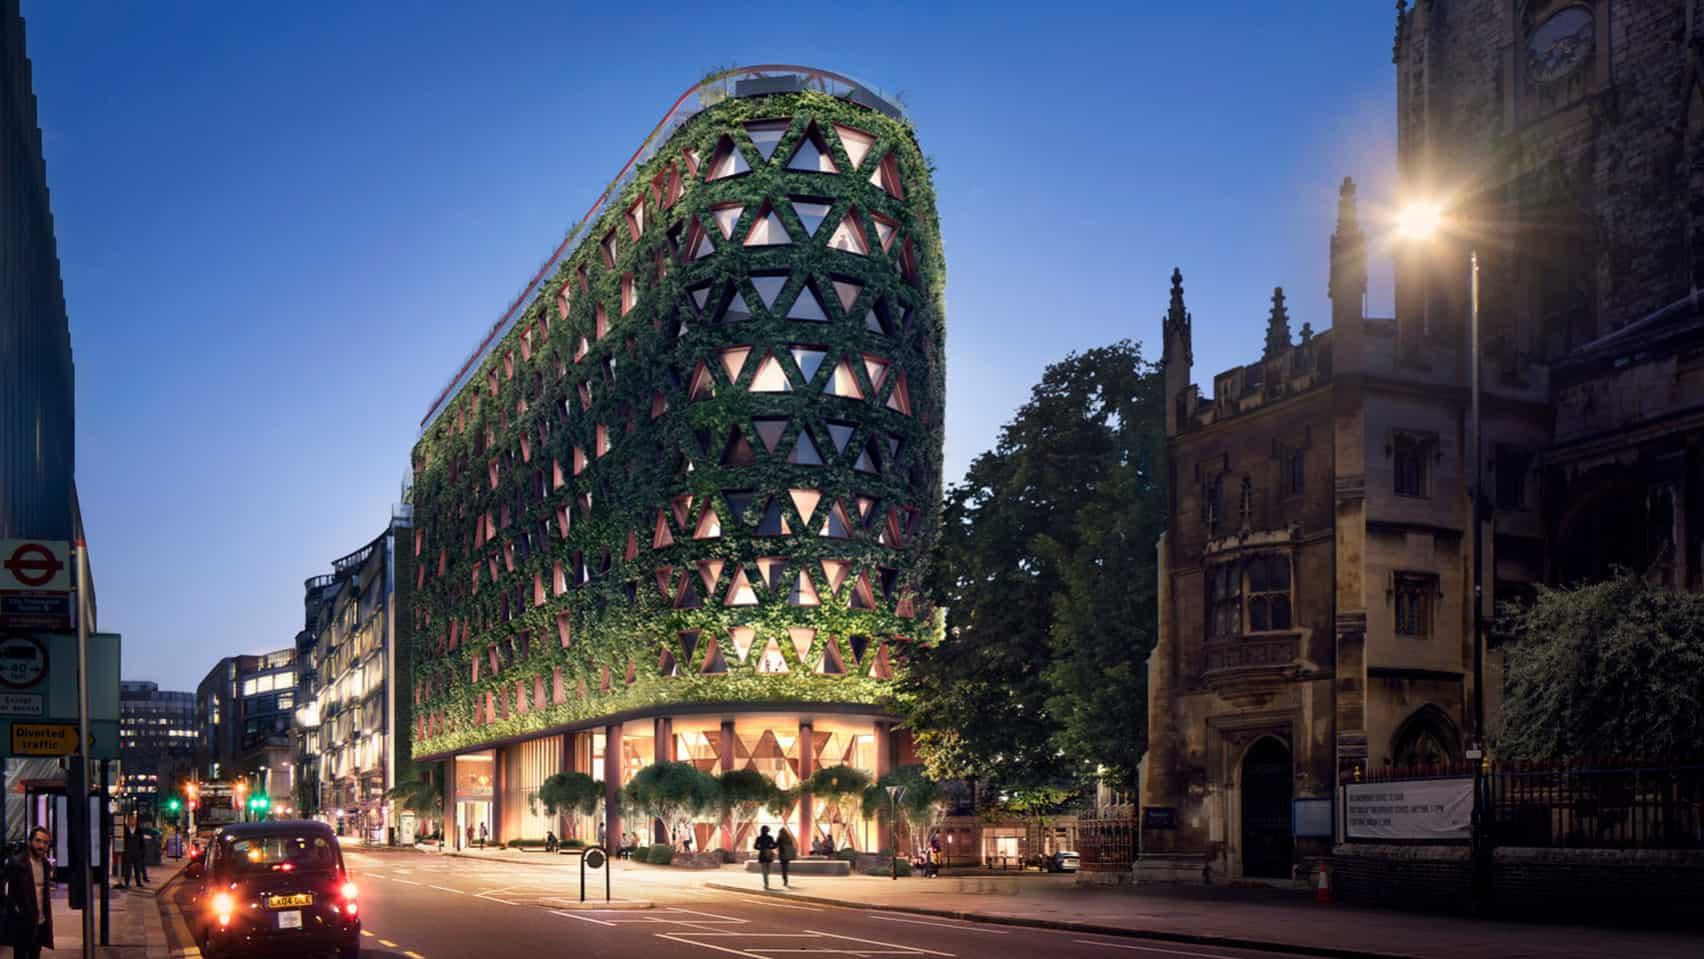 citicape-sheppard-robson-architecture-green-walls-london-uk-england-_dezeen_1704_hero